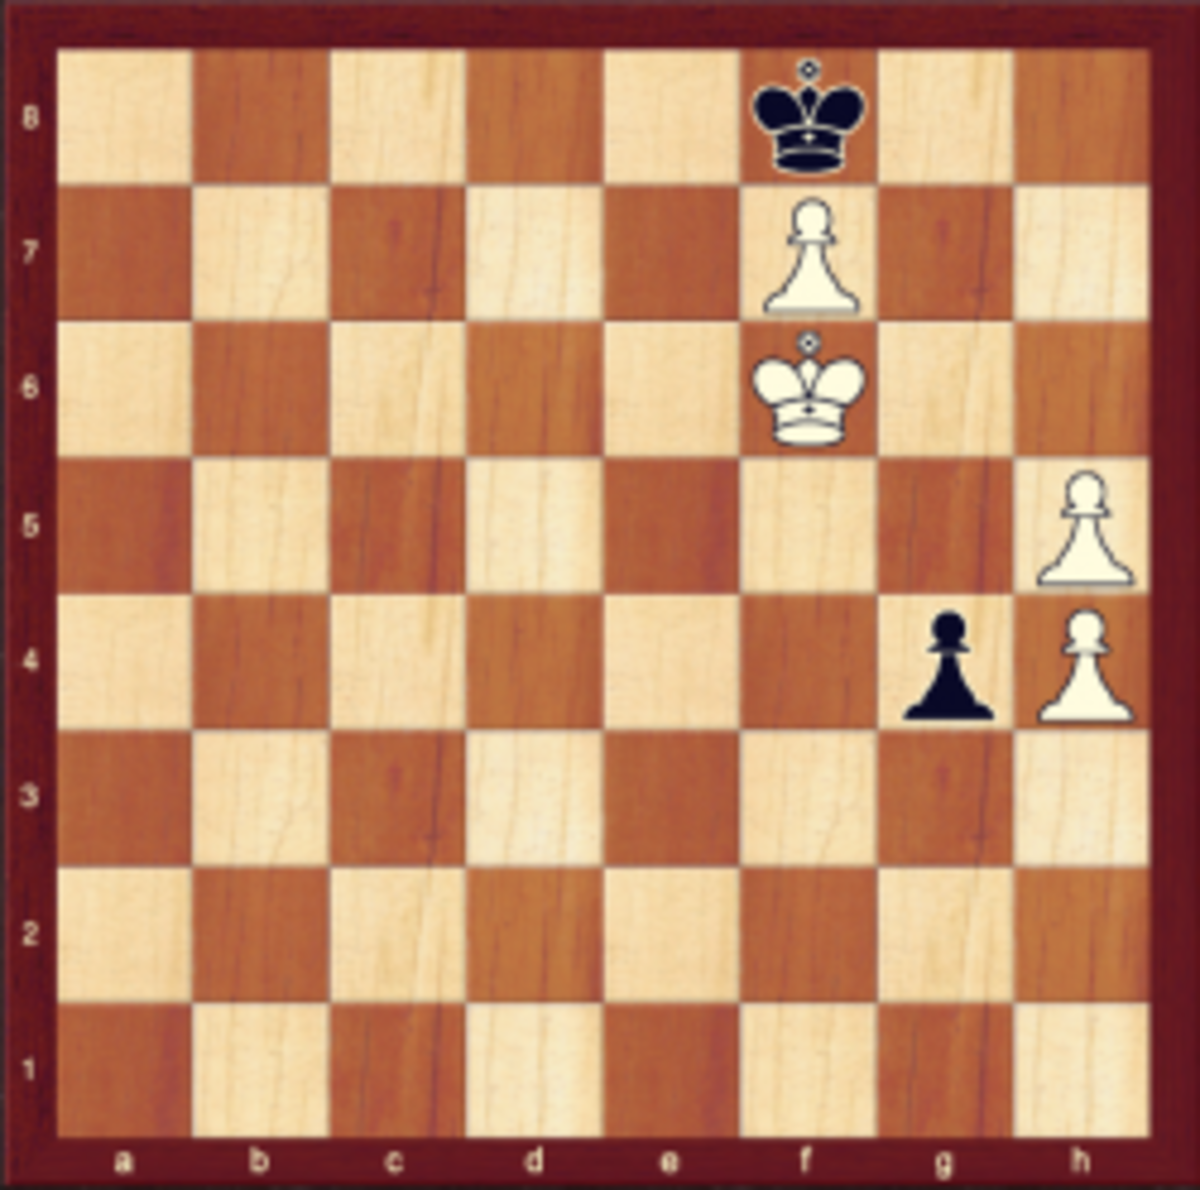 Final position in Tartakower vs. Koenig, Vienna 1922